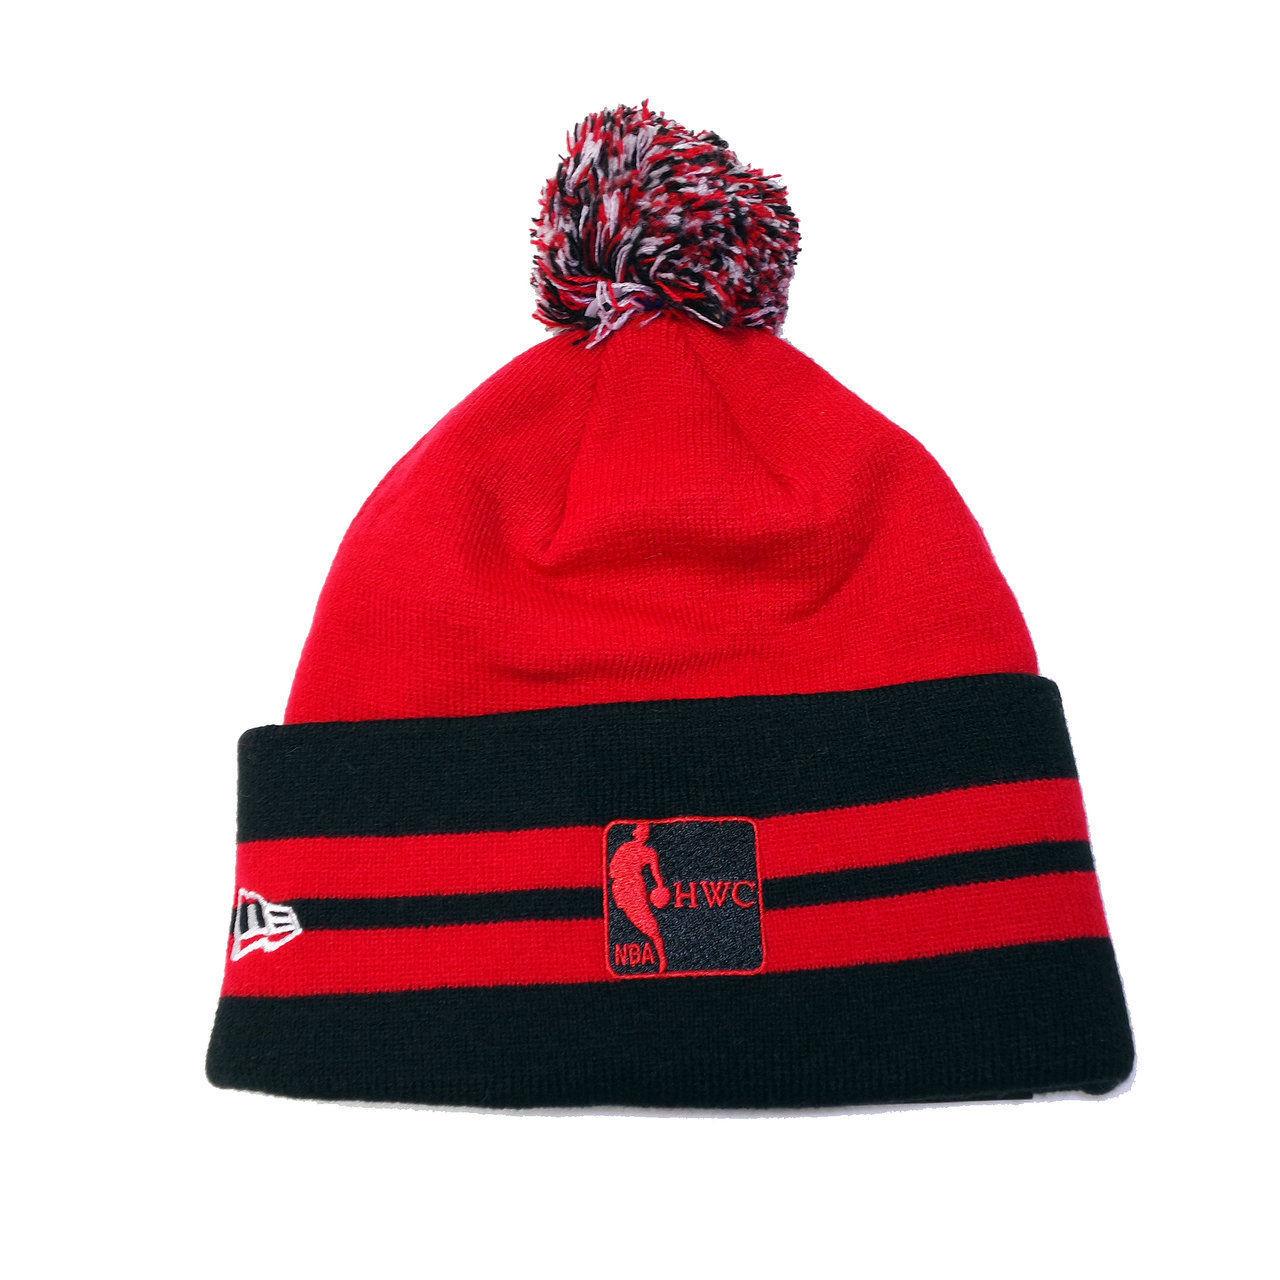 New Era NBA Miami Heat Red Logo Wide Top Cuffed Knit Pom Beanie Hats